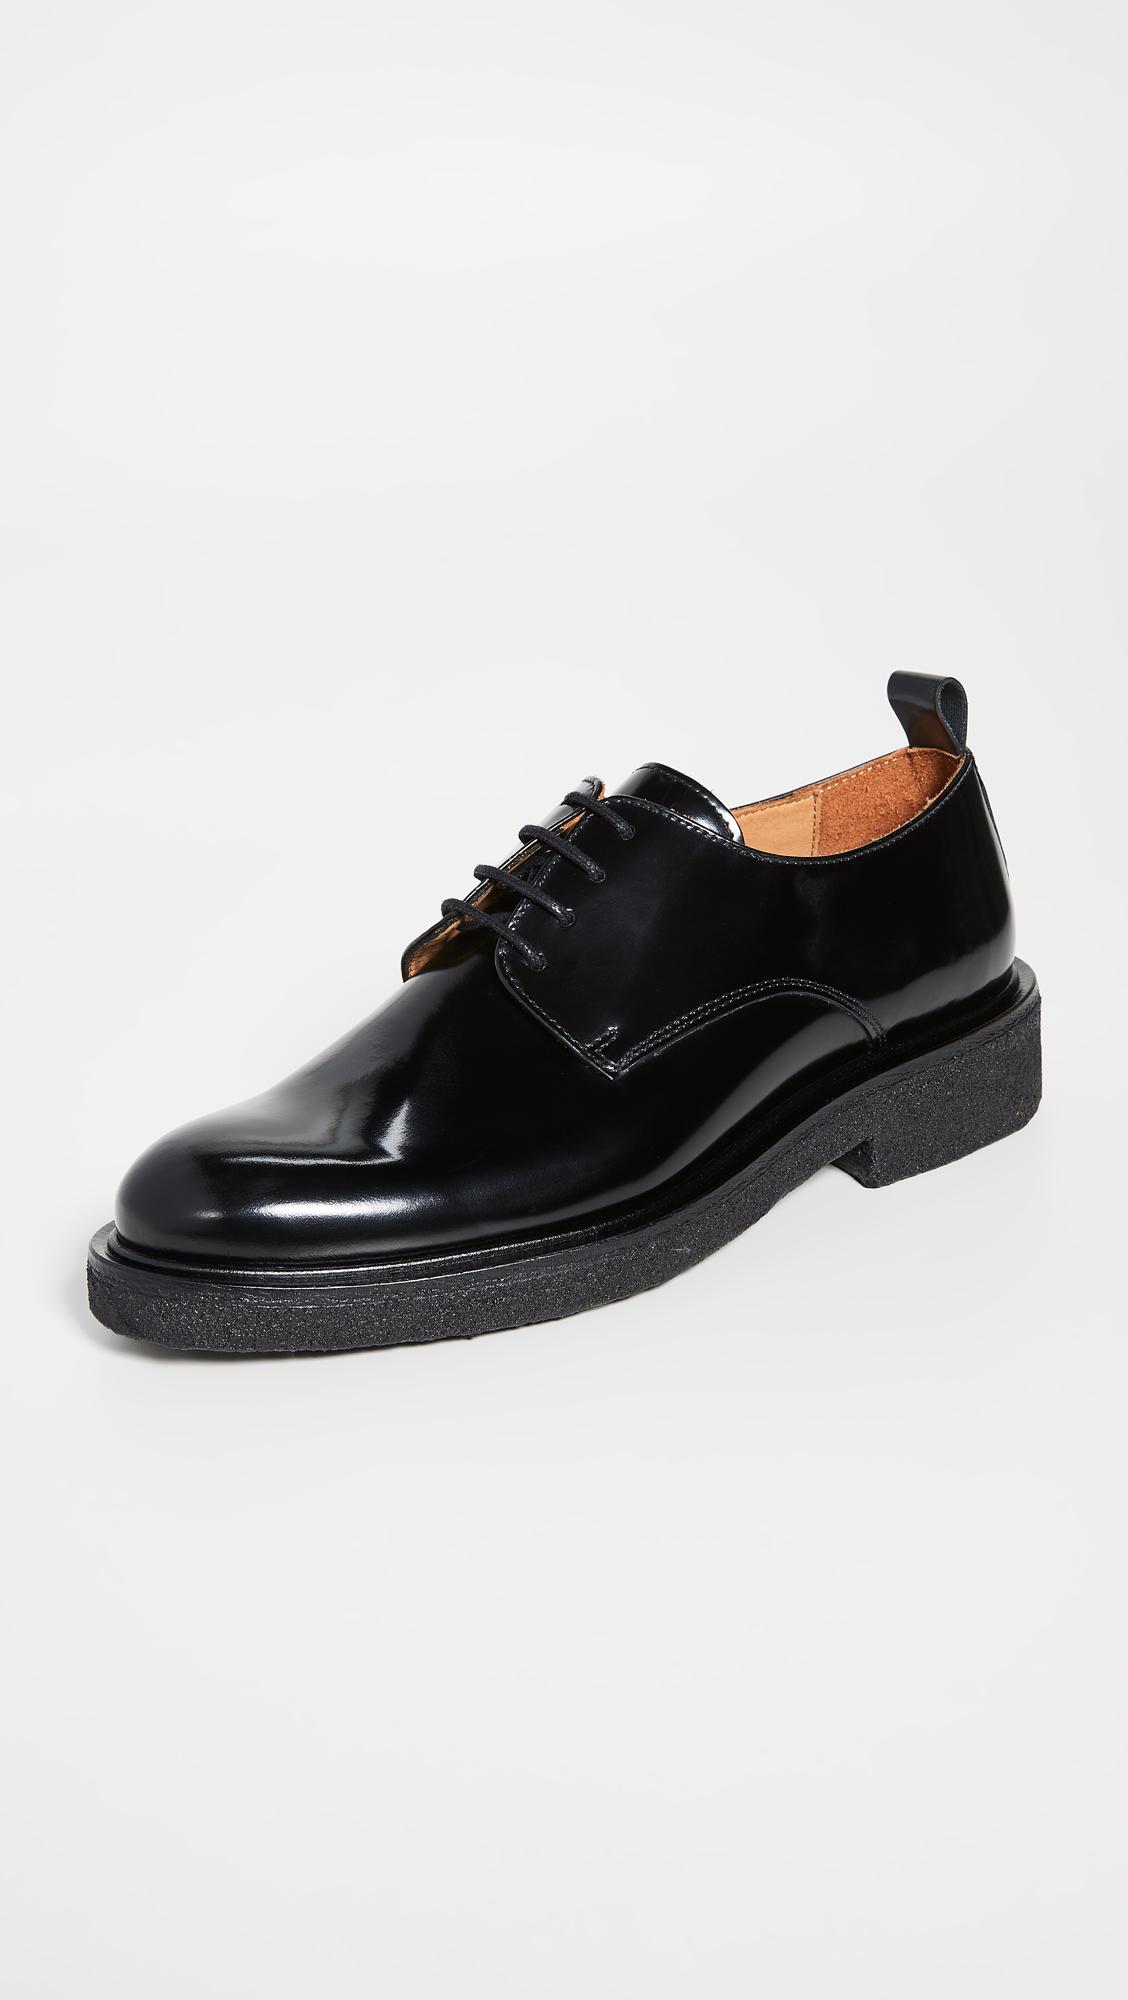 47e9ddf57d87f AMI Derby Shoes   EAST DANE